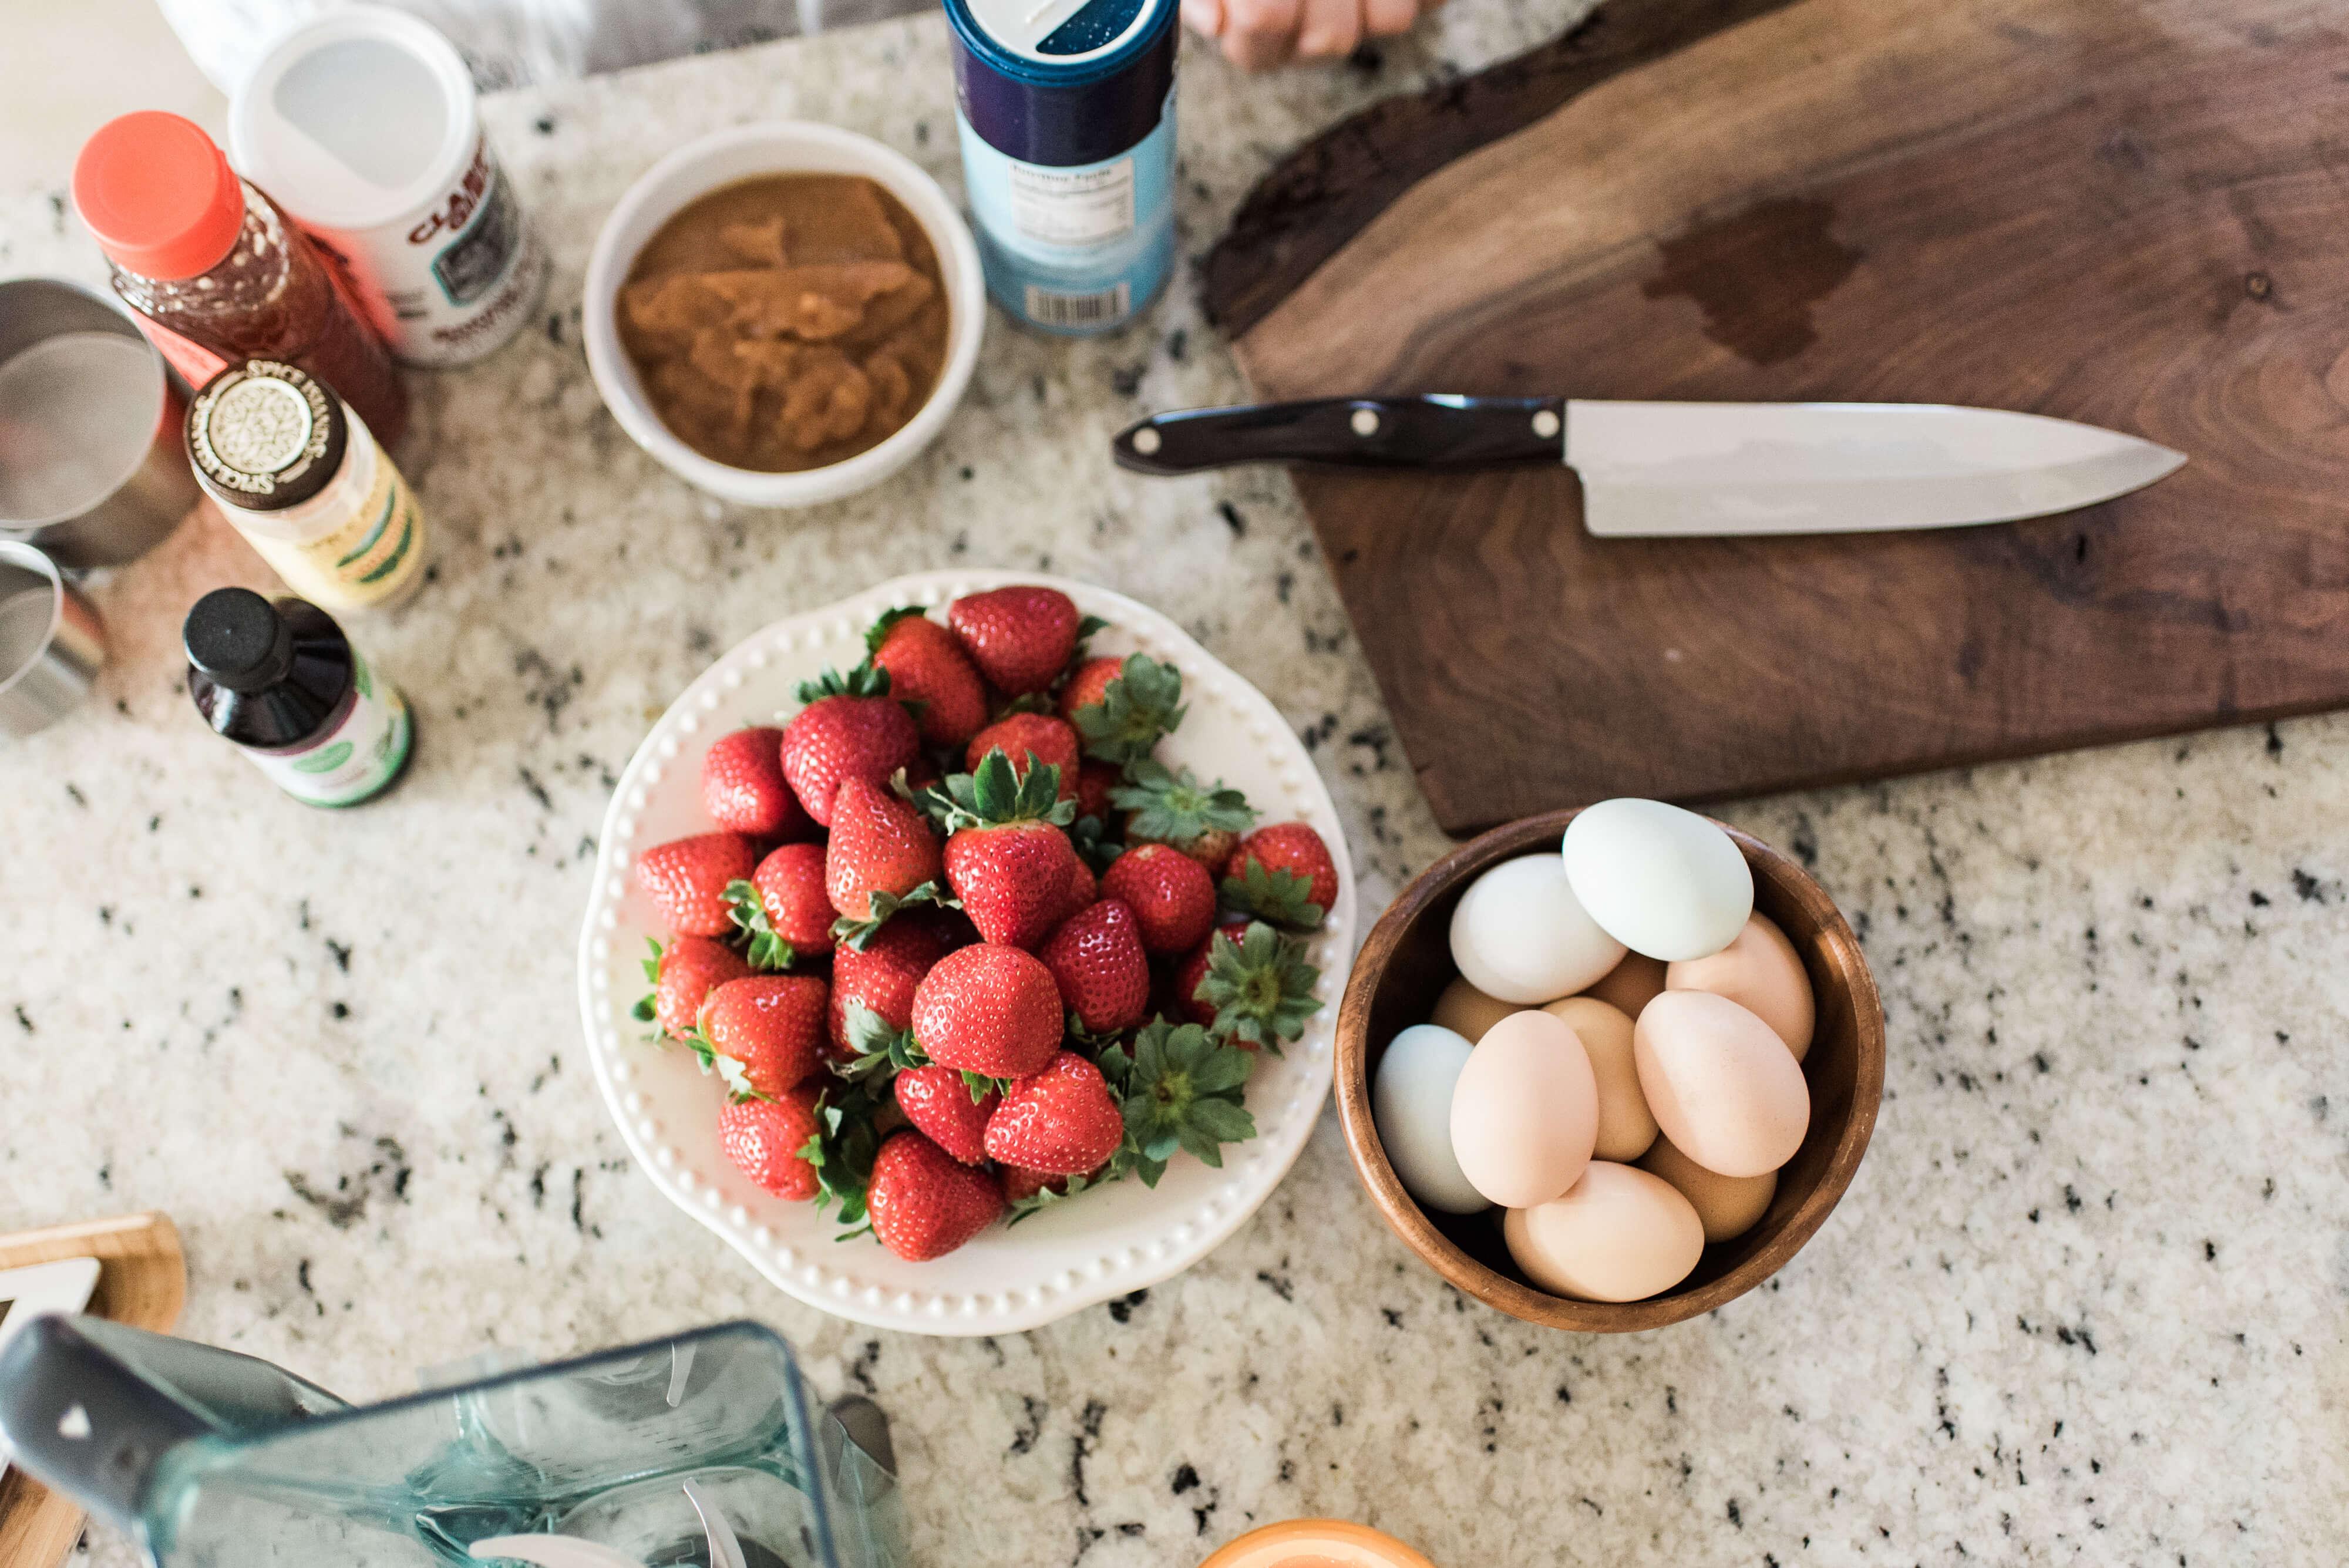 Image result for Making Dinner at home